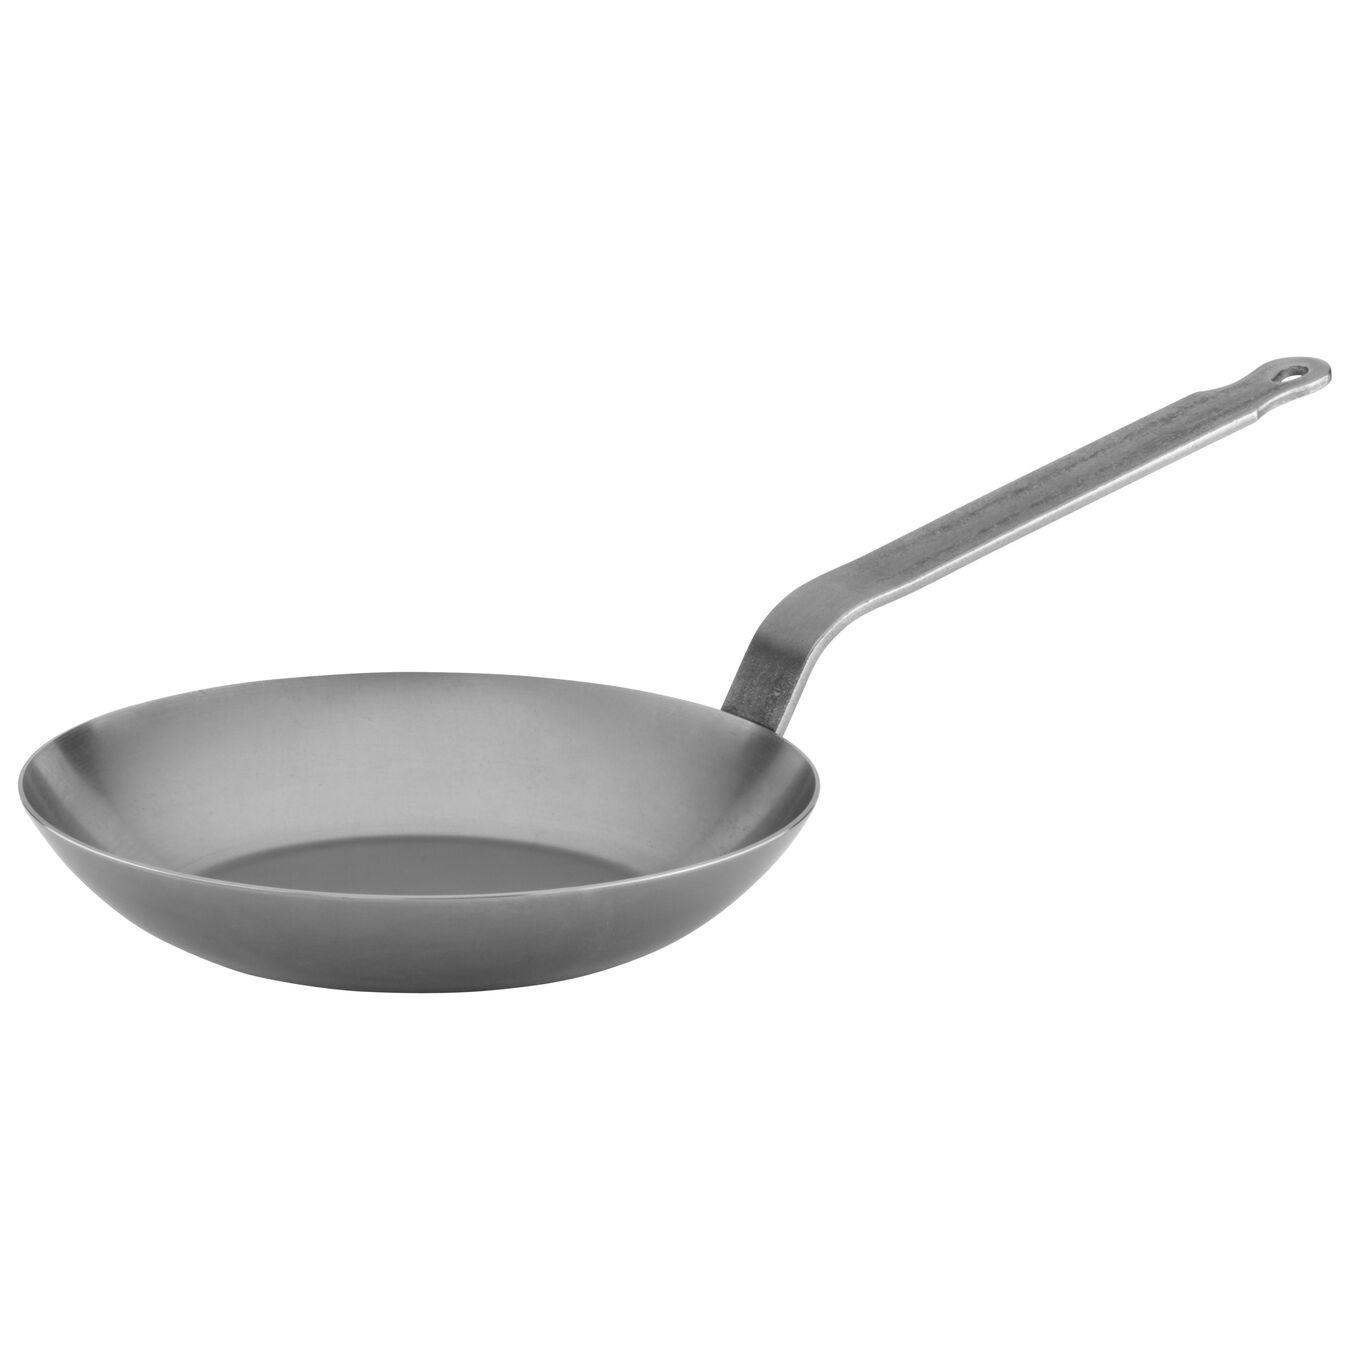 24 cm / 9.5 inch Frying pan,,large 1